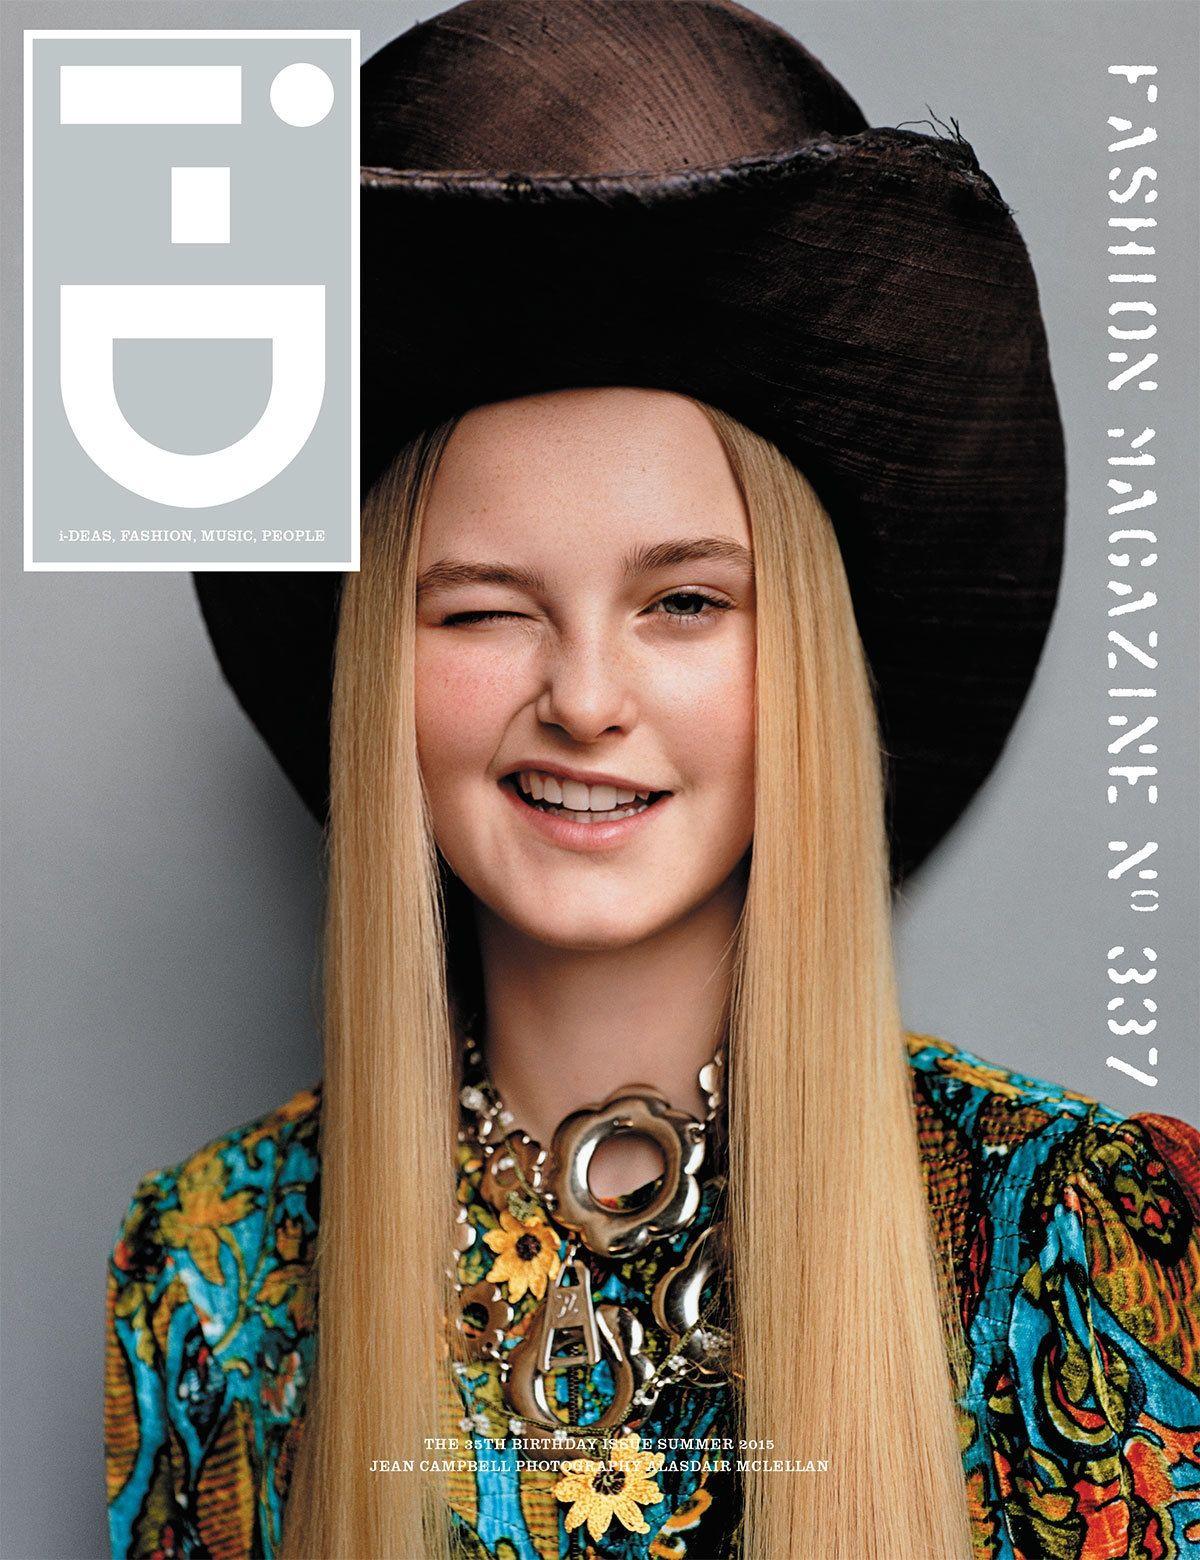 2019 year lifestyle- I d 35th magazine anniversary summer